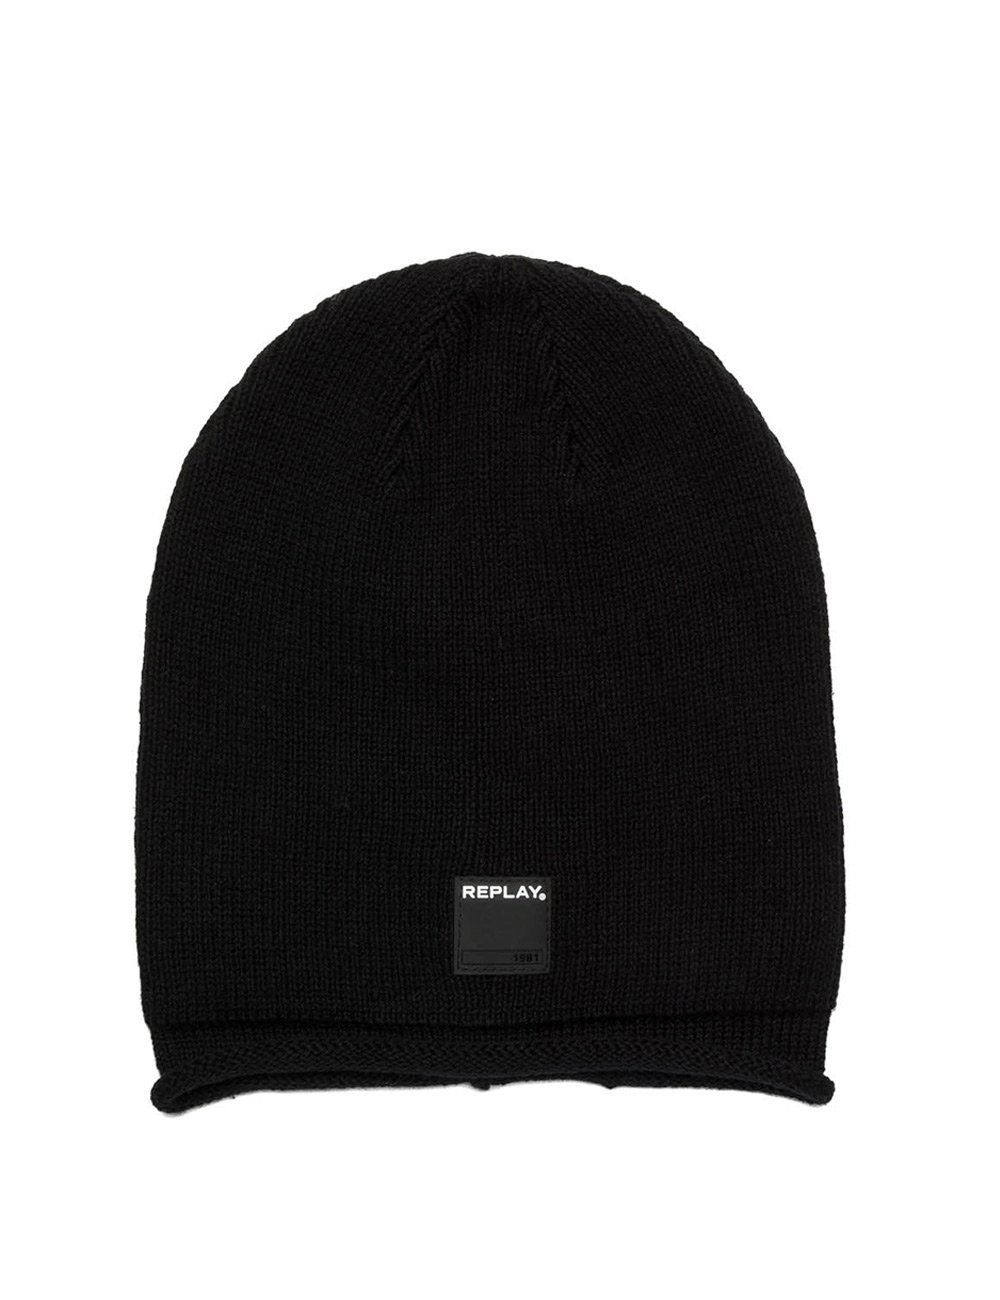 Replay Men's Men's Cotton Beanie In Black Black